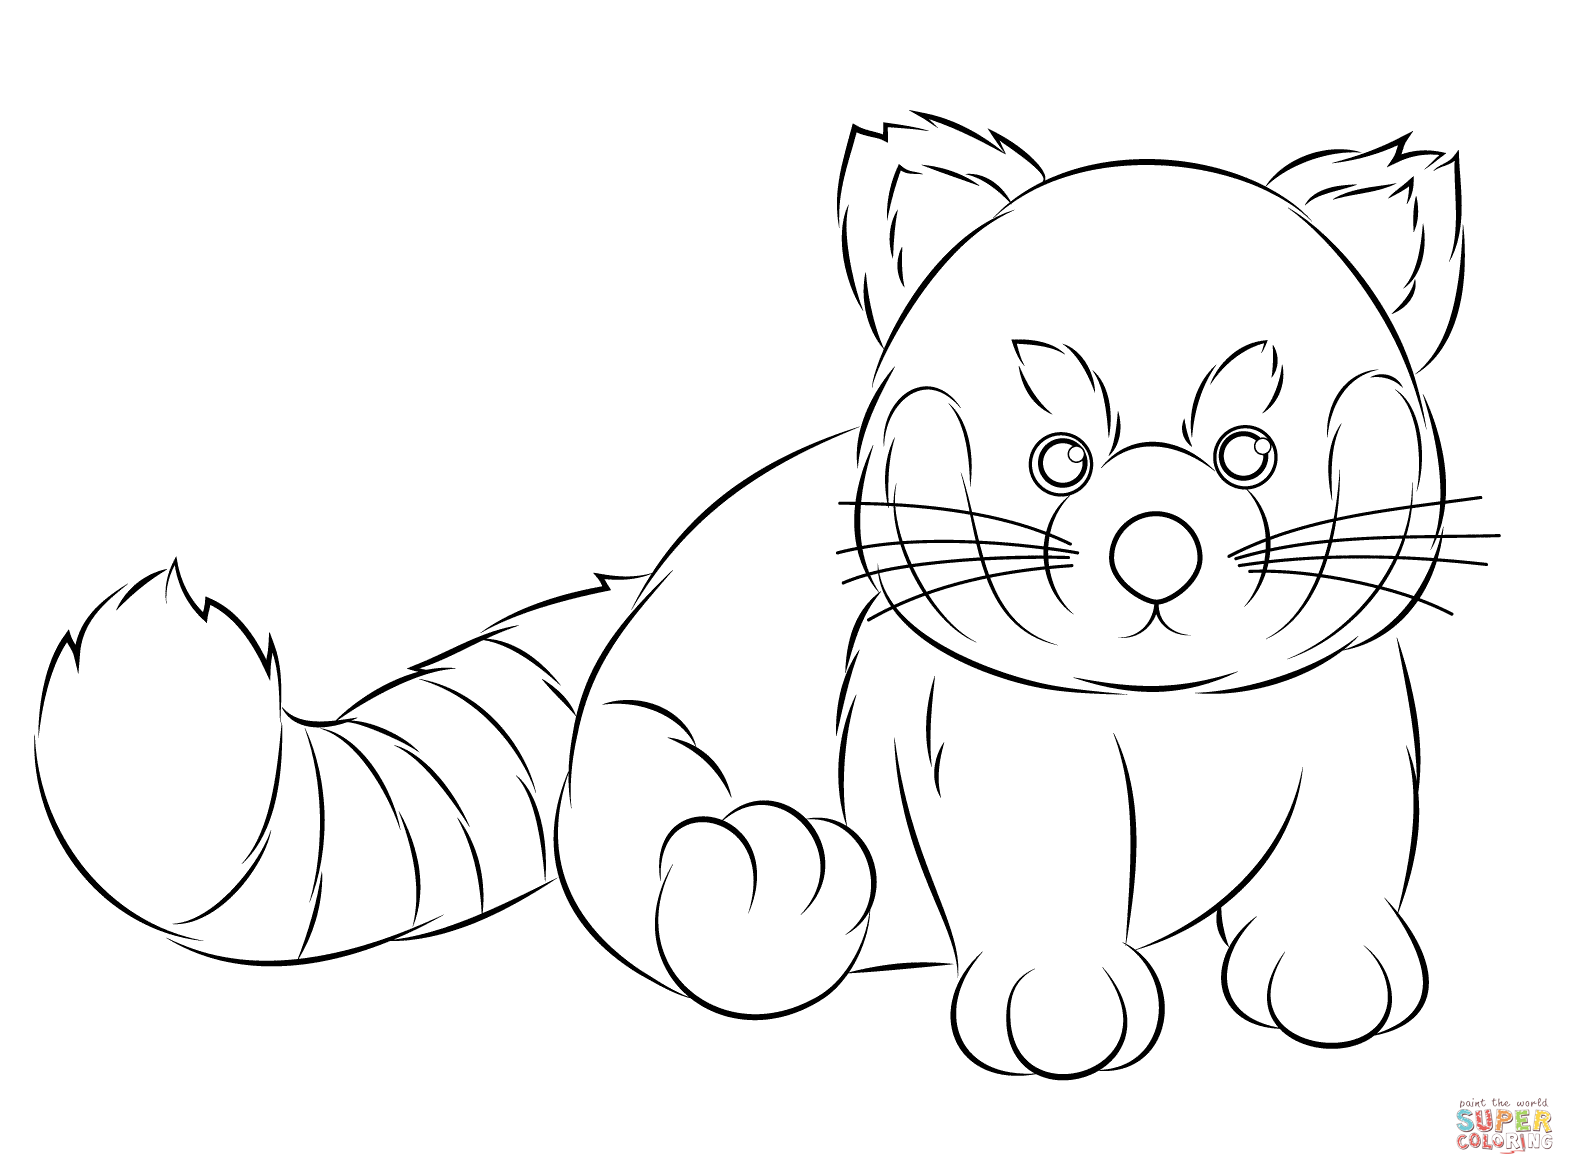 red dot pilot cat